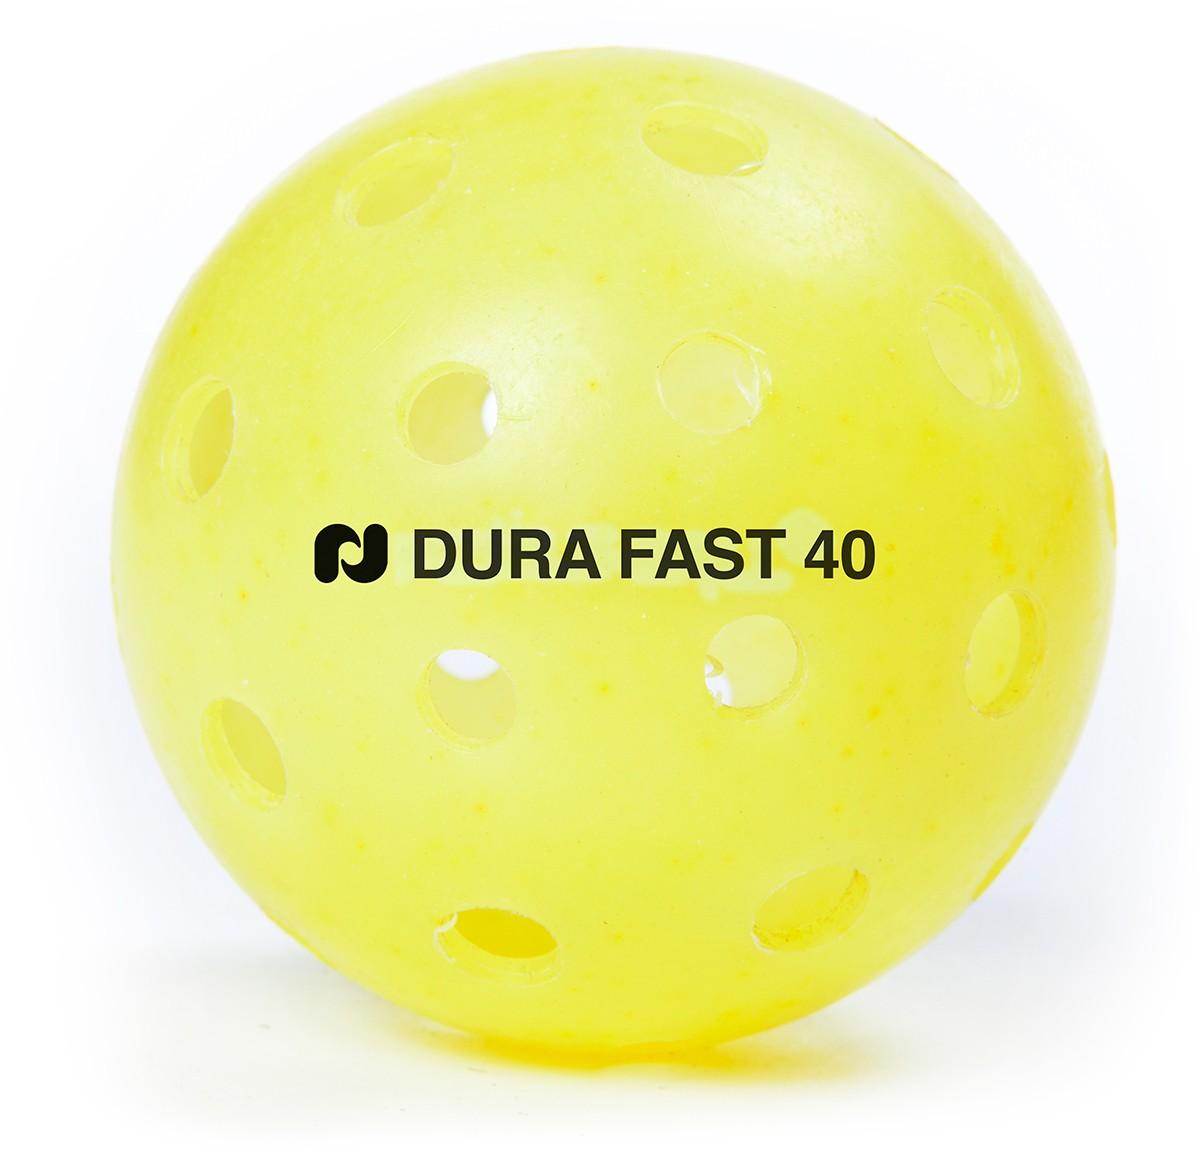 Dura Fast 40 Outdoor Pickleball Balls 12pk